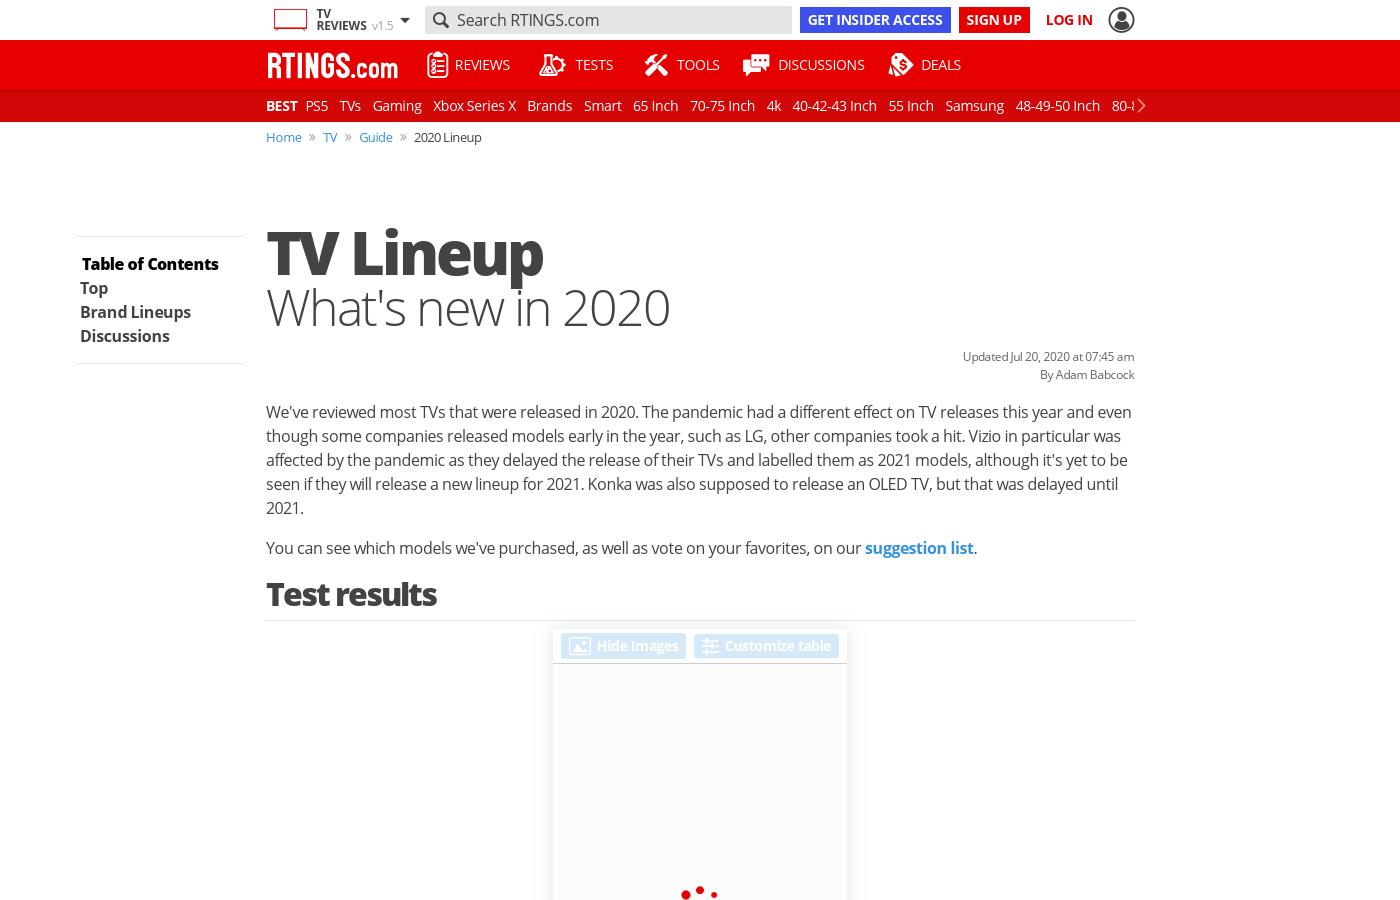 2020 Lineup